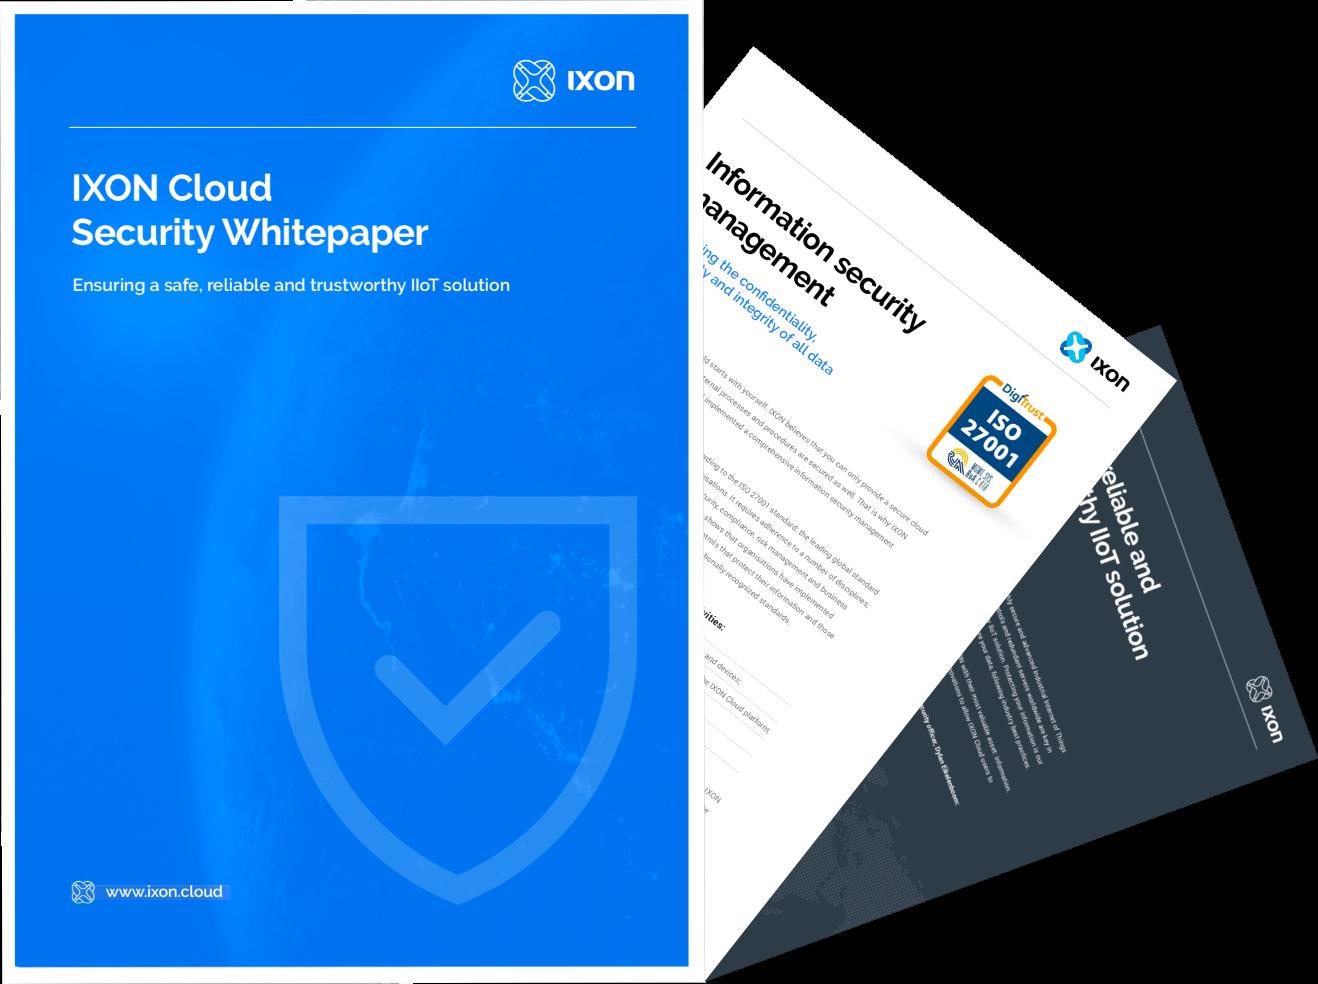 IXON Cloud Security Whitepaper